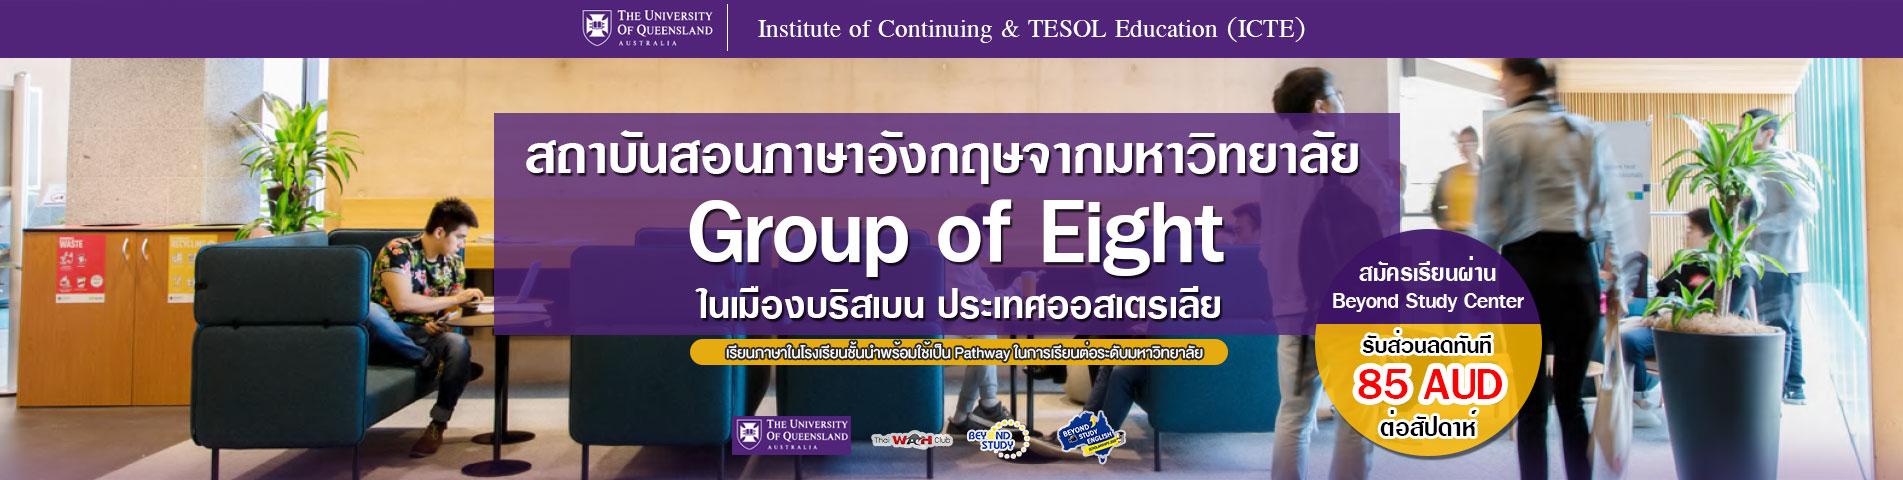 UQ-ICTE-Beyond-Study-Scholarships-2020